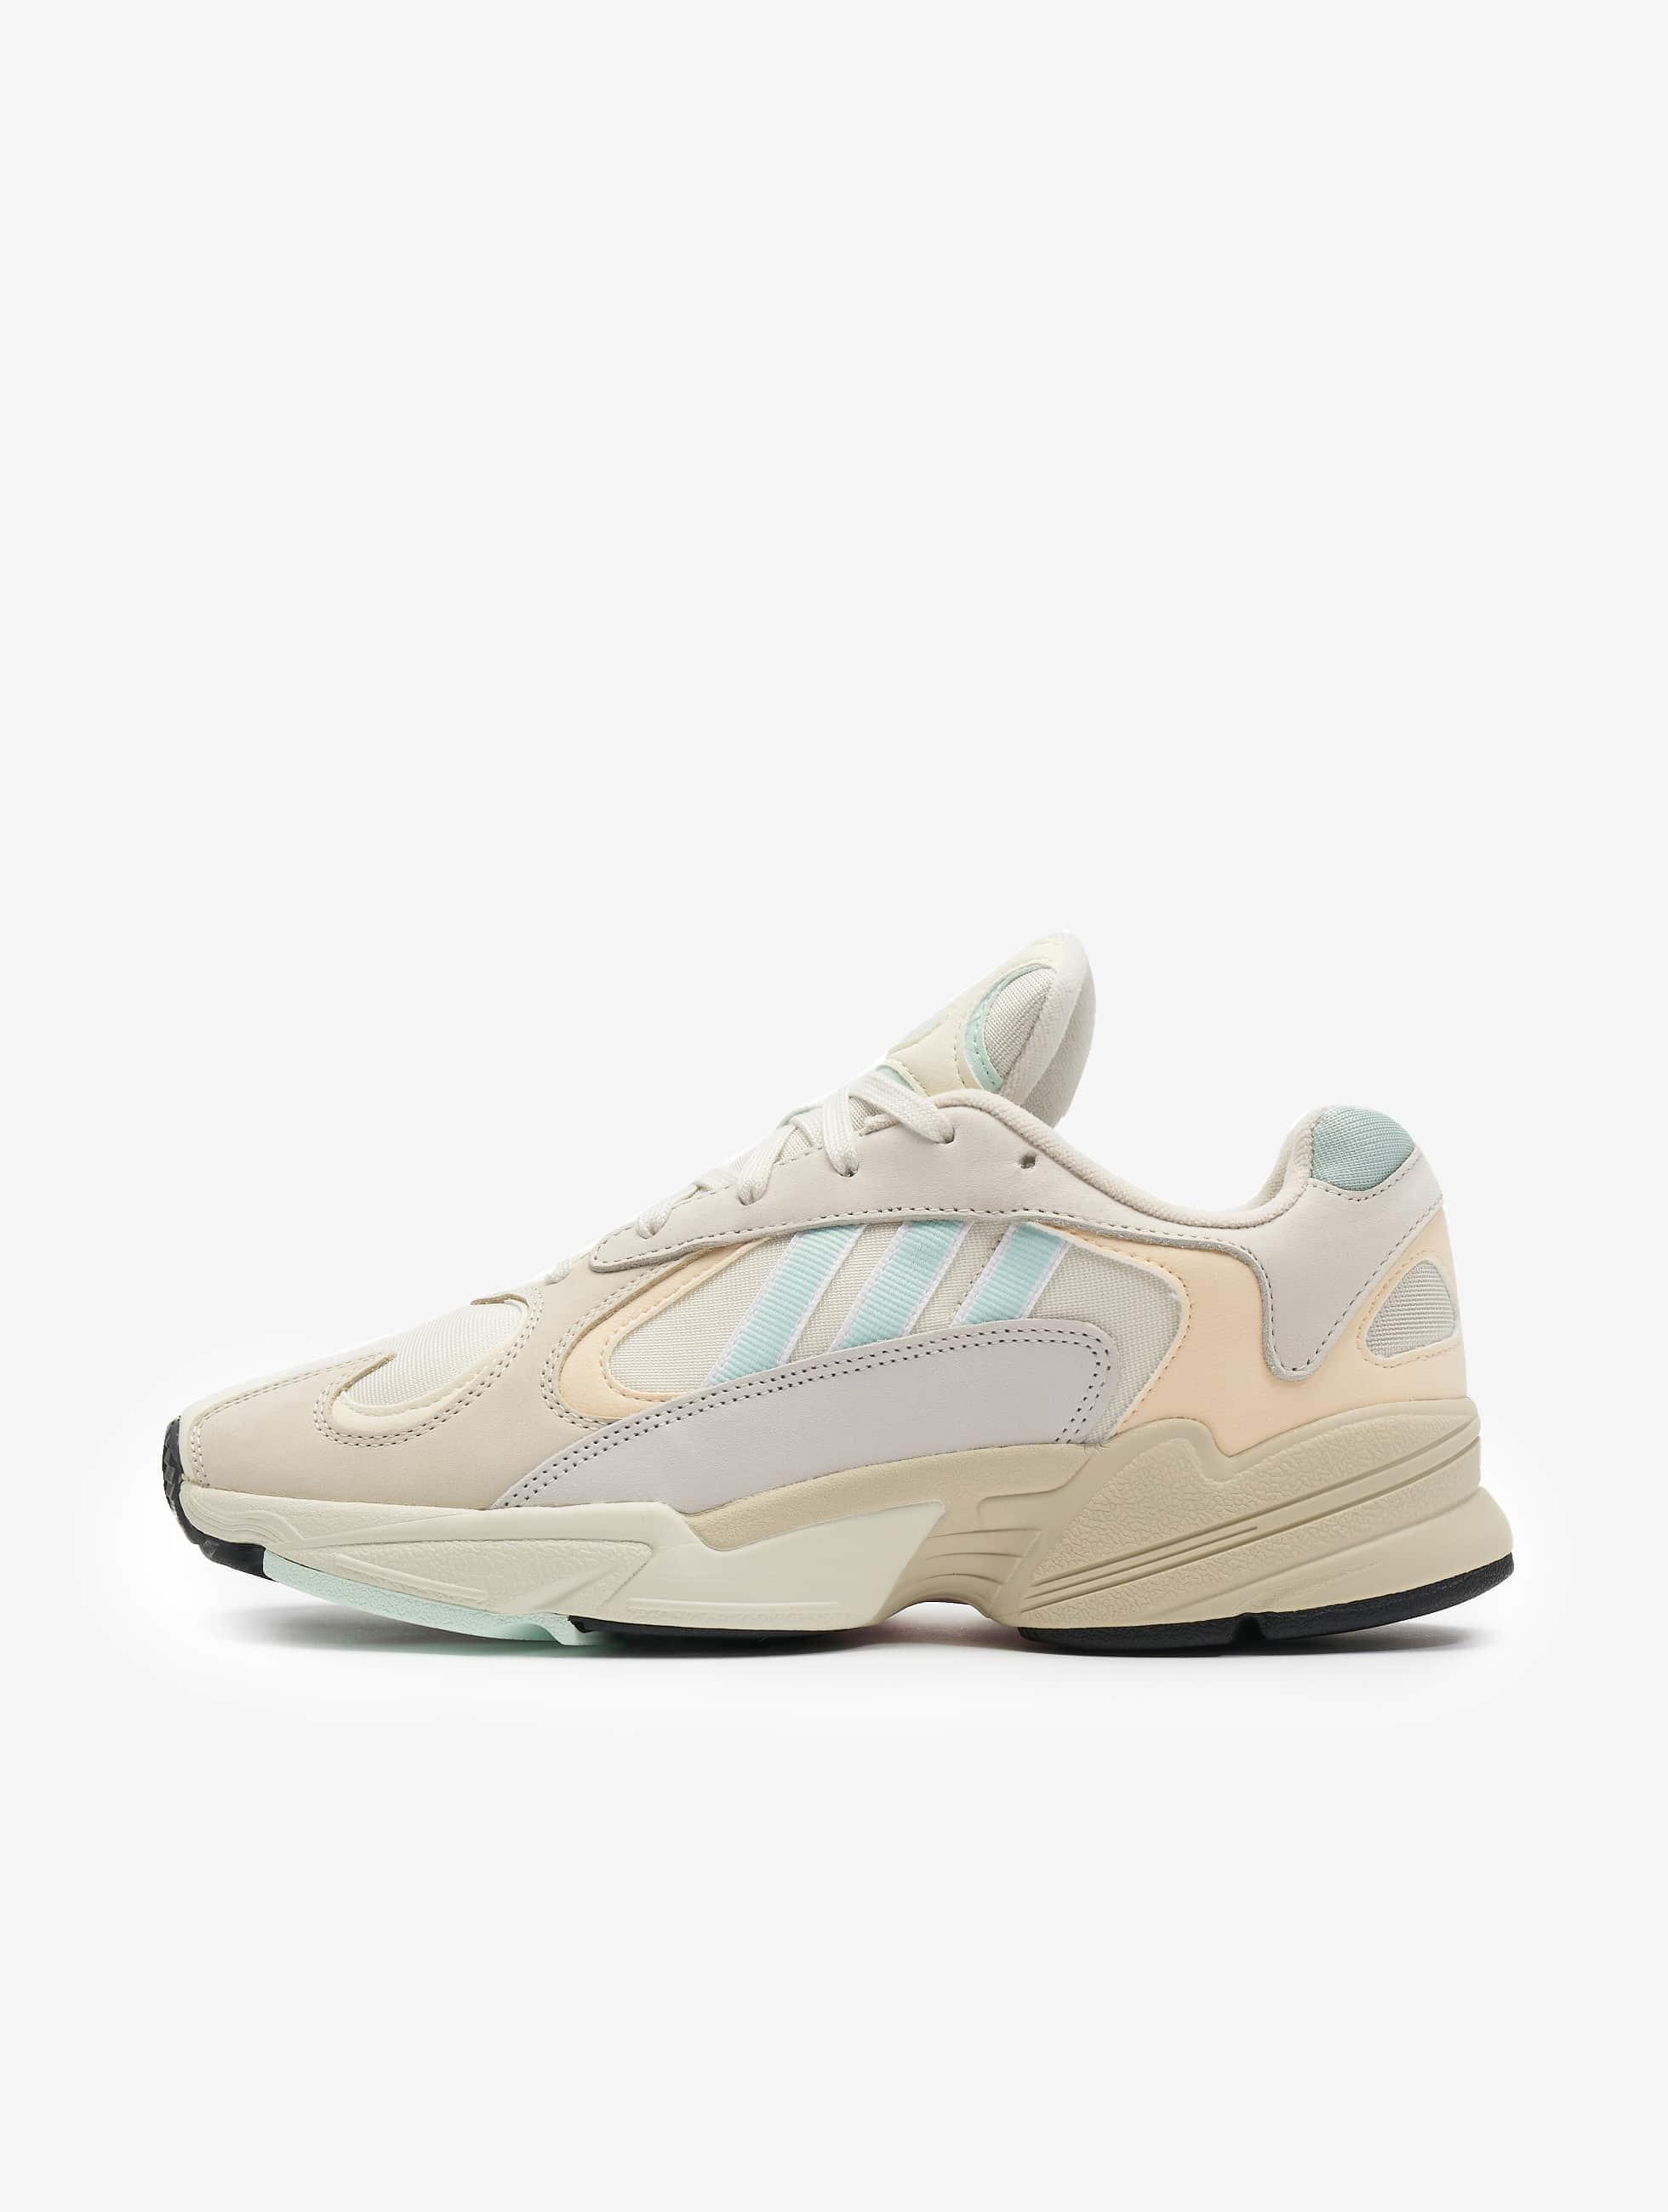 Adidas Originals Yung 1 Sneakers Off WhiteIce MintEcrtin